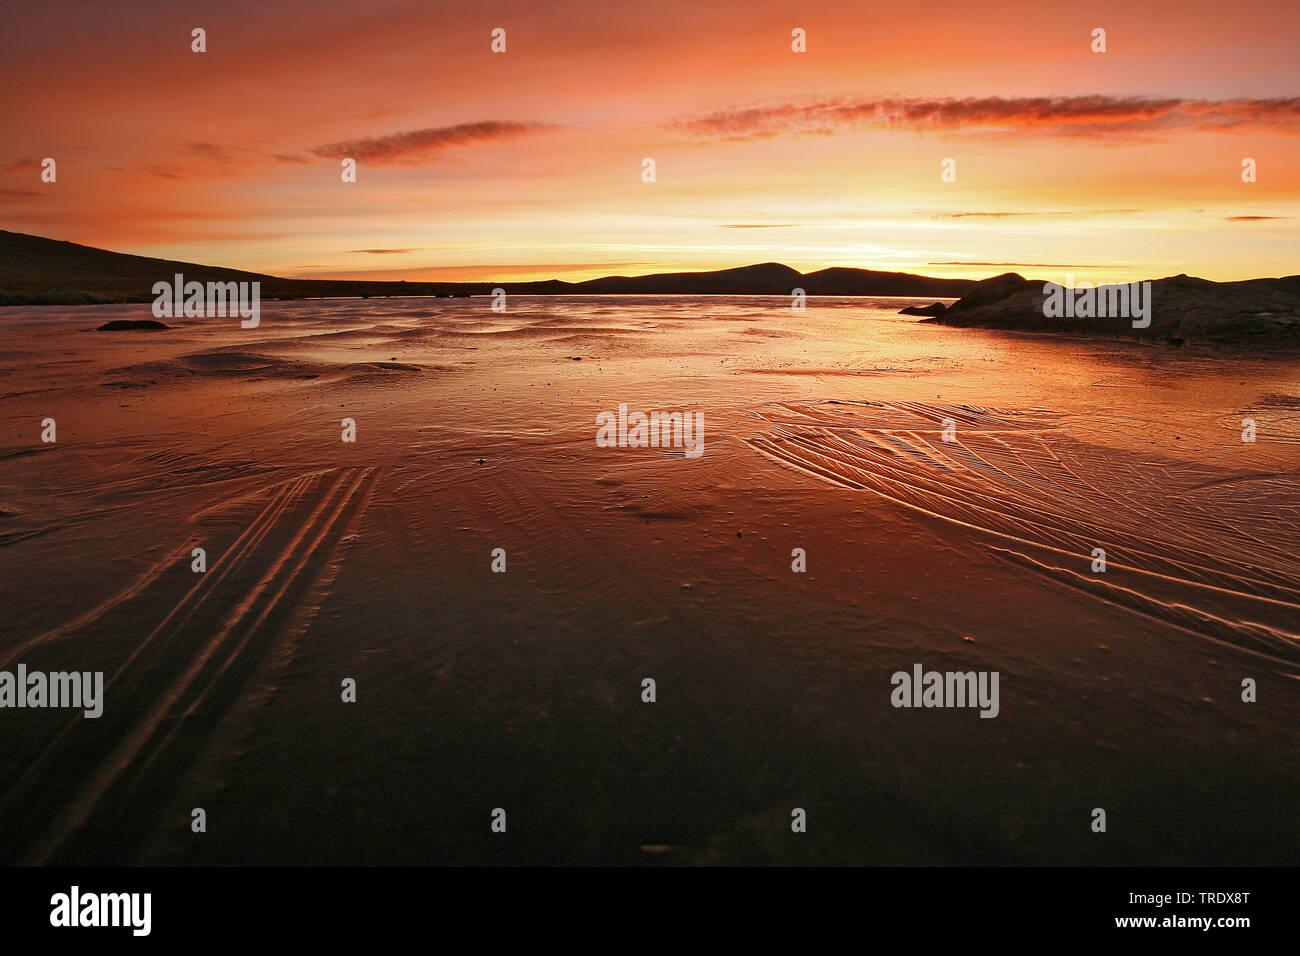 Valdresflya bei Sonnenuntergang, Norwegen, Valdresflya | Valdresflya at sunset, Norway, Valdresflya | BLWS511564.jpg [ (c) blickwinkel/AGAMI/K. Wilmer - Stock Image